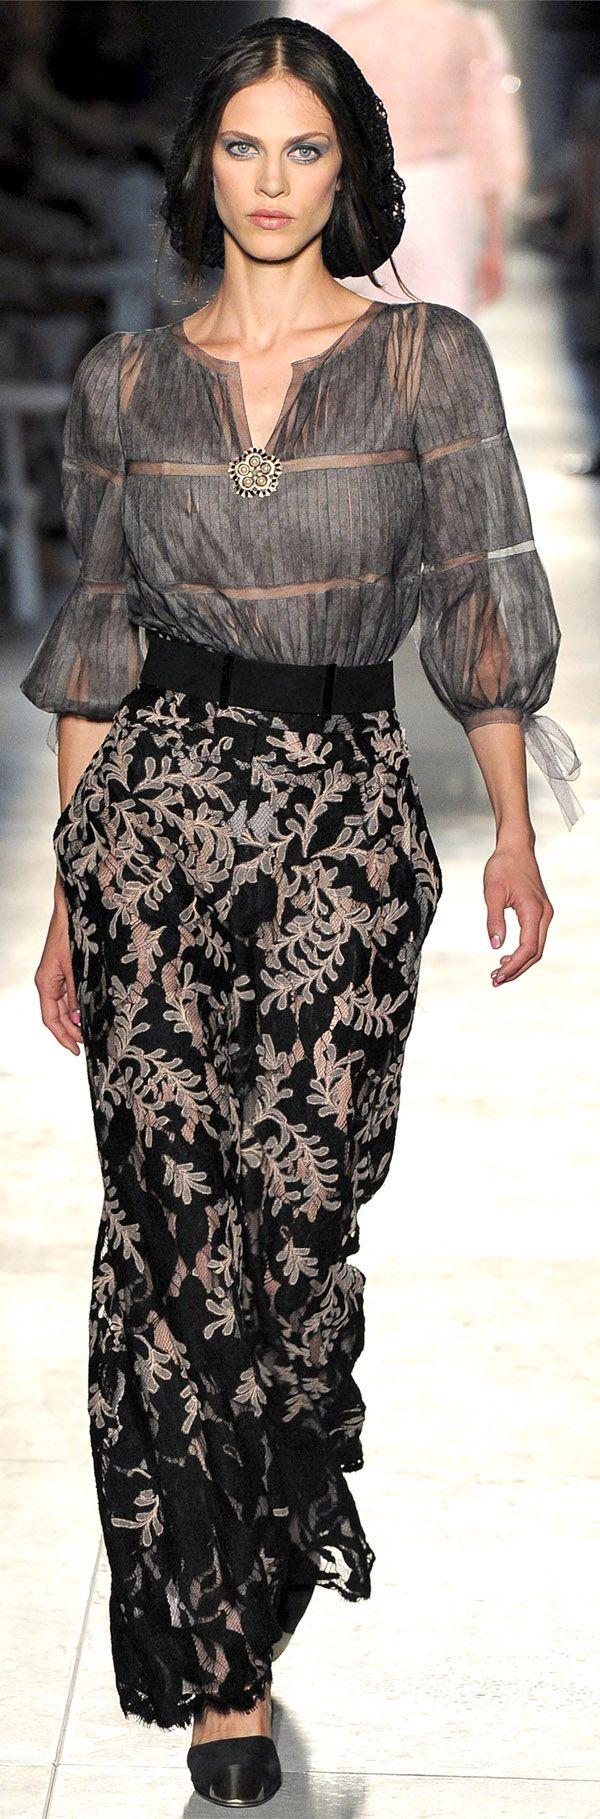 Runway Fashions Couture / ✜ Chanel | Paris | Winter 2013 ✜ http://www.vogue.it/en/shows/show/haute-couture-fall-winter-2012/chanel